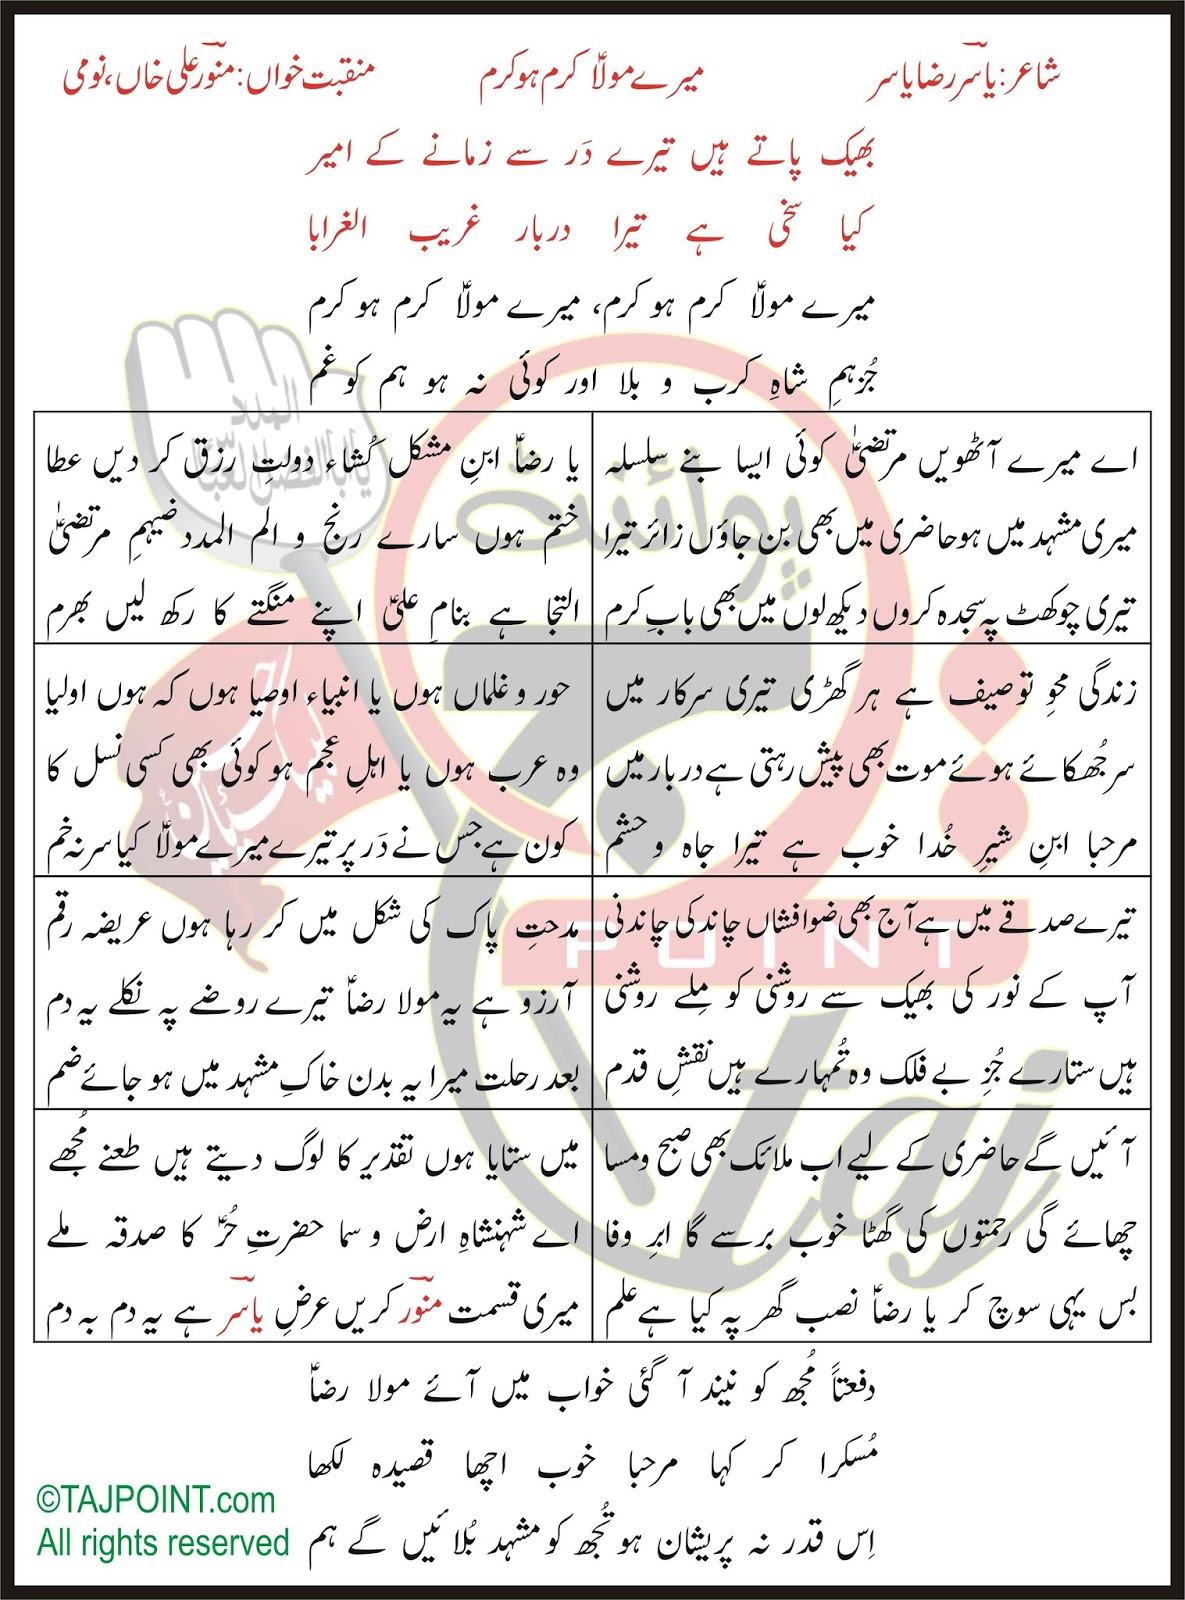 Mere Maula Karam Ho Karam Lyrics In Urdu and Roman Urdu